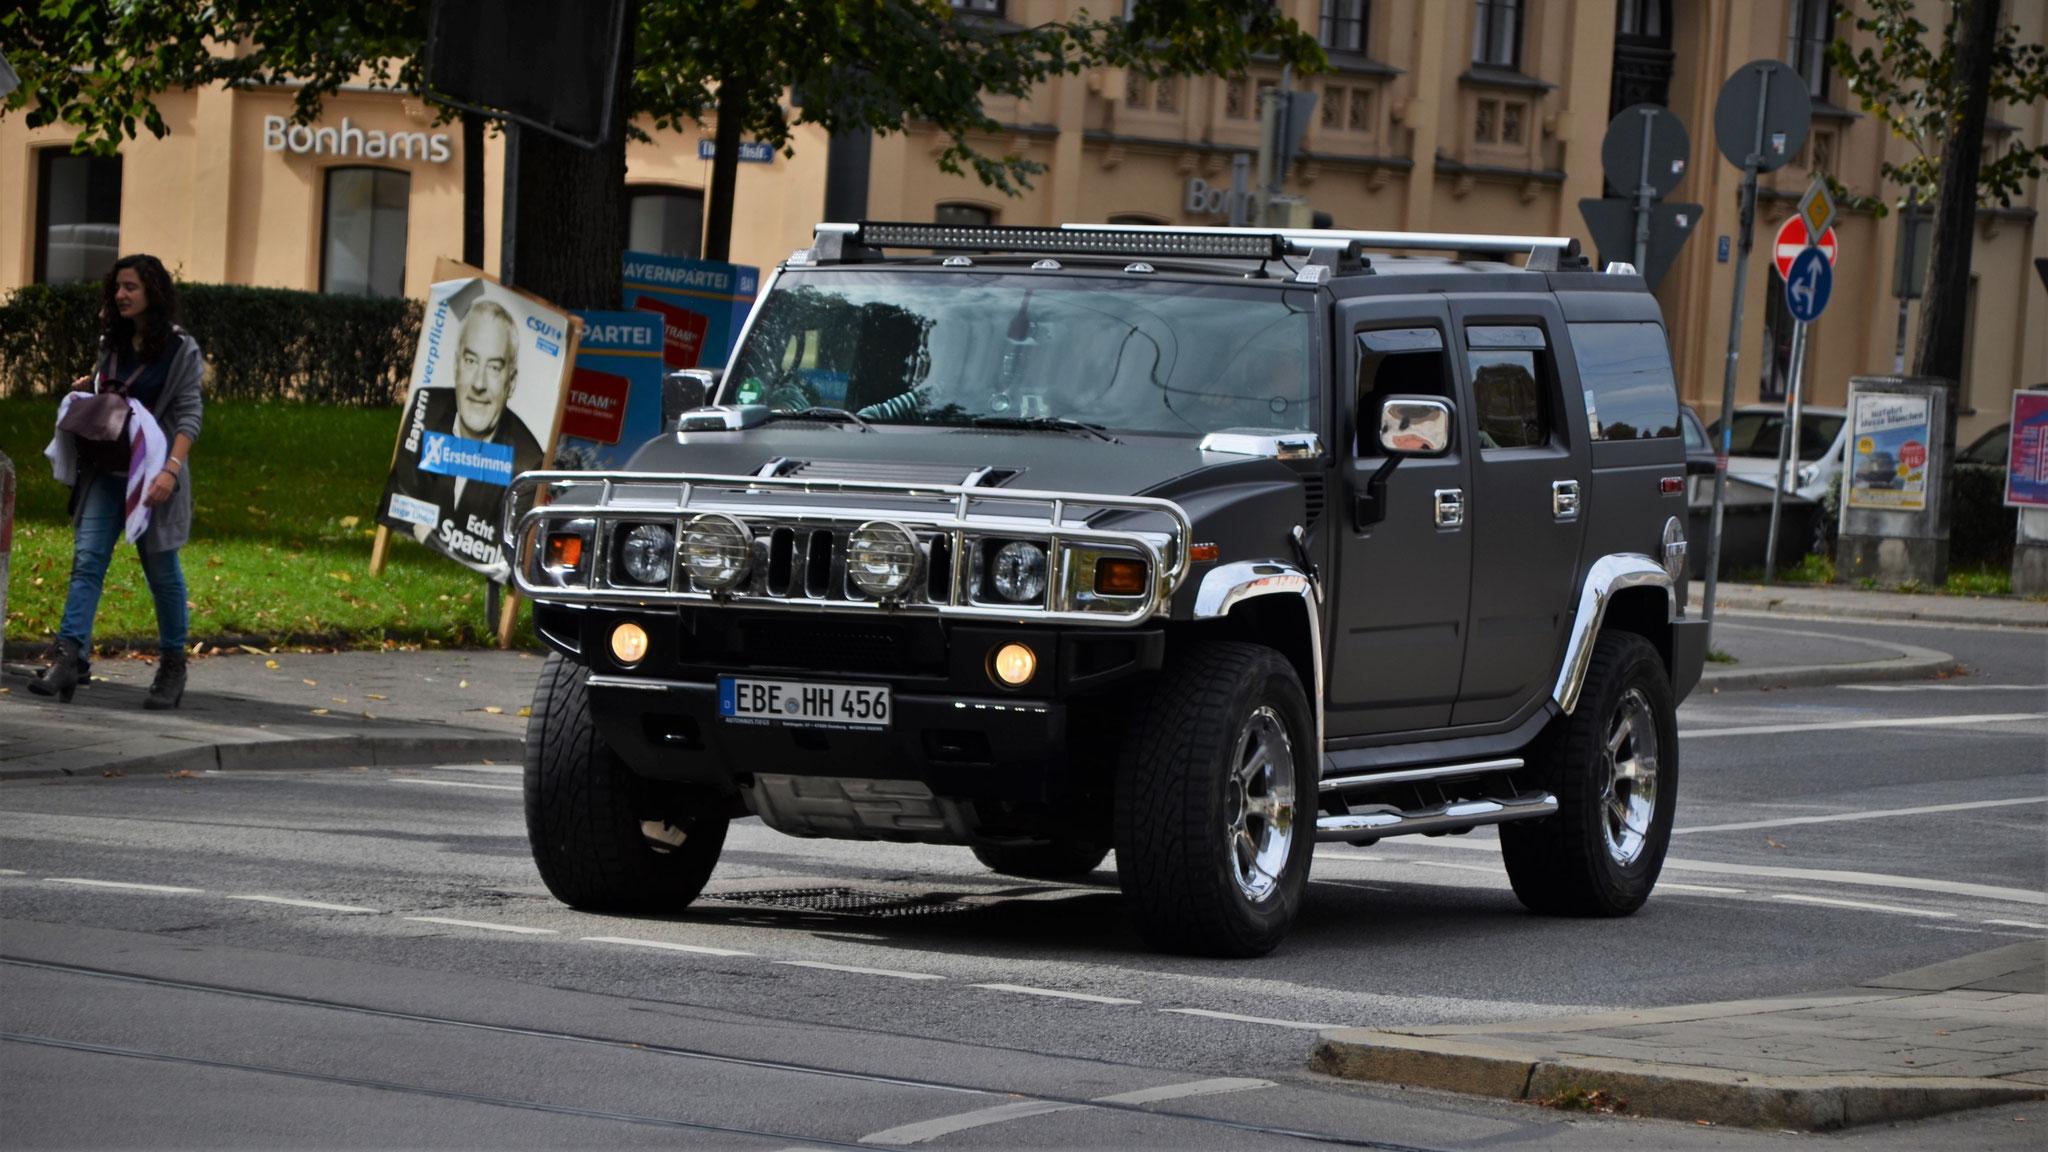 Hummer H2 - EBE-HH-456